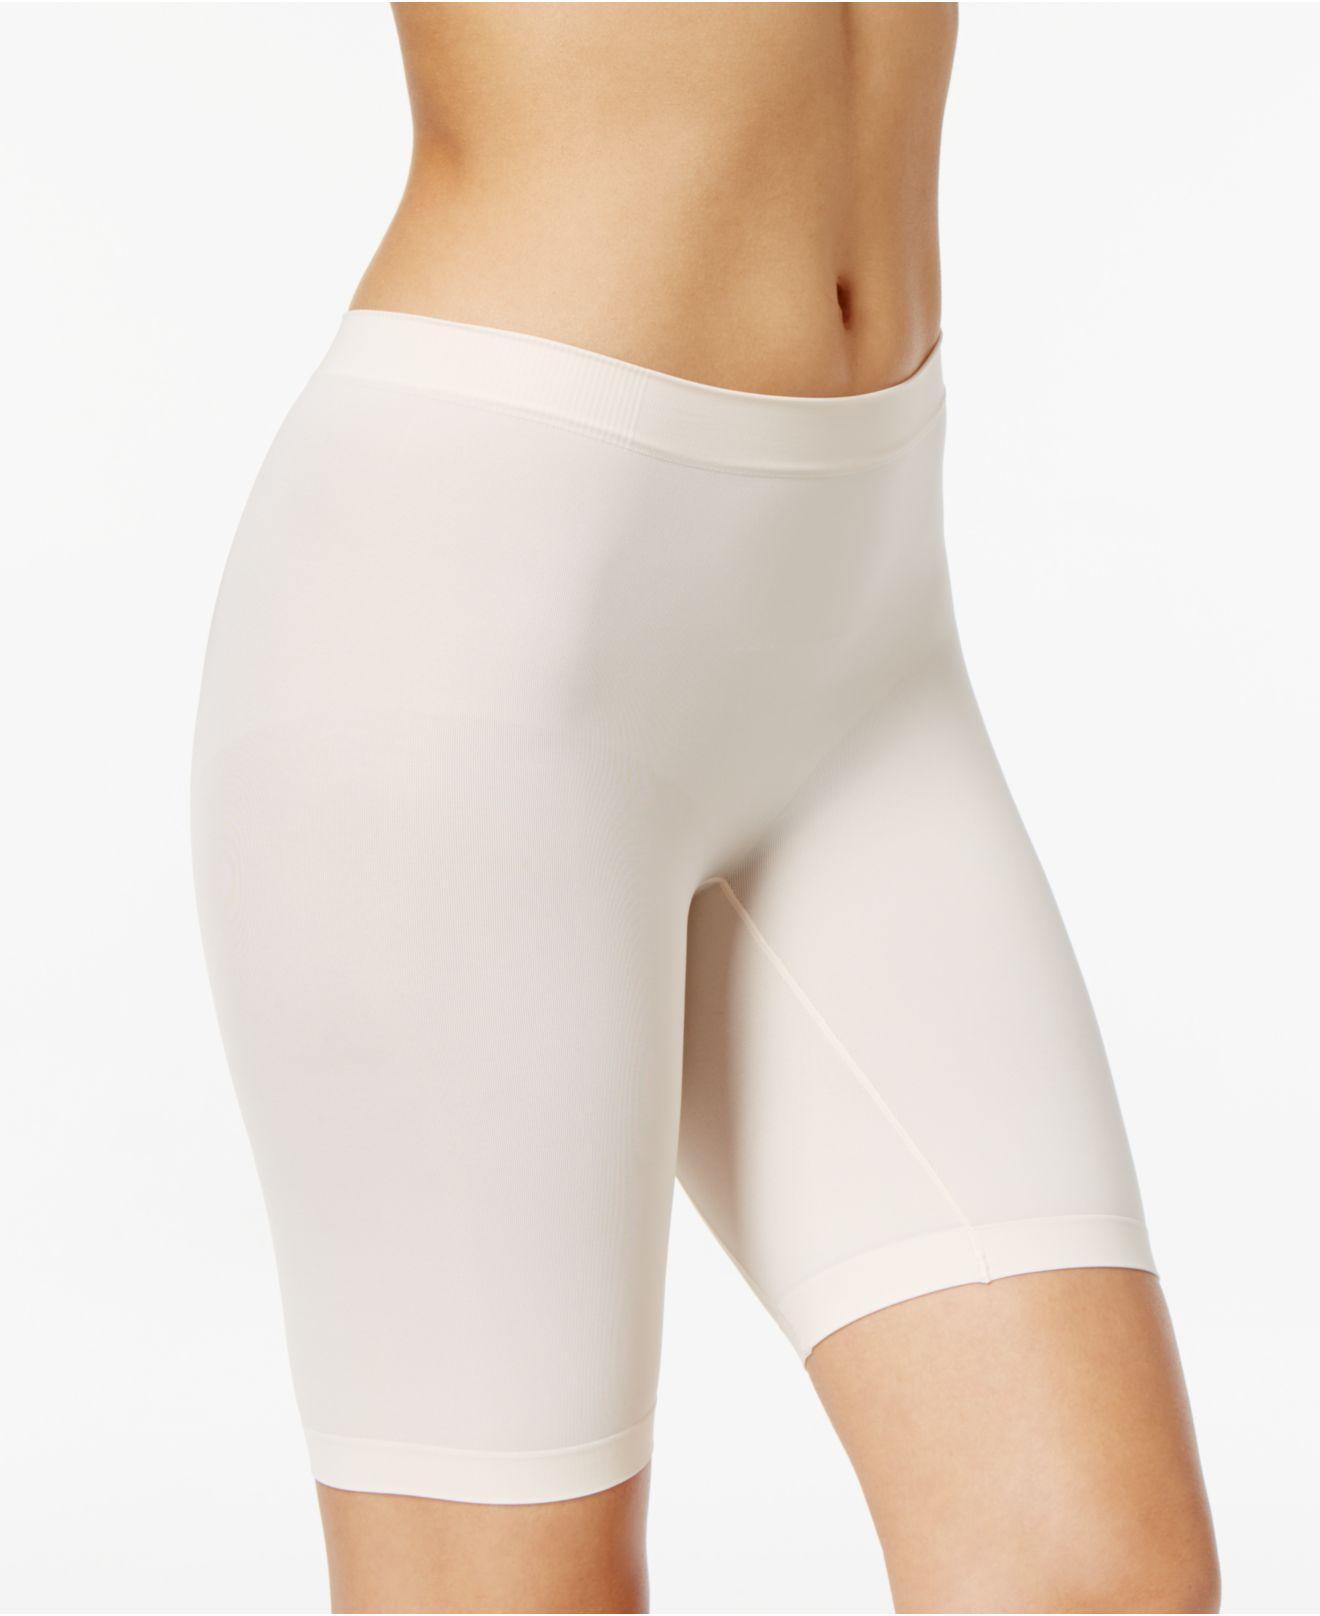 47fad6395 Jockey. Women s Natural Skimmies No-chafe Mid-thigh Slip Short ...